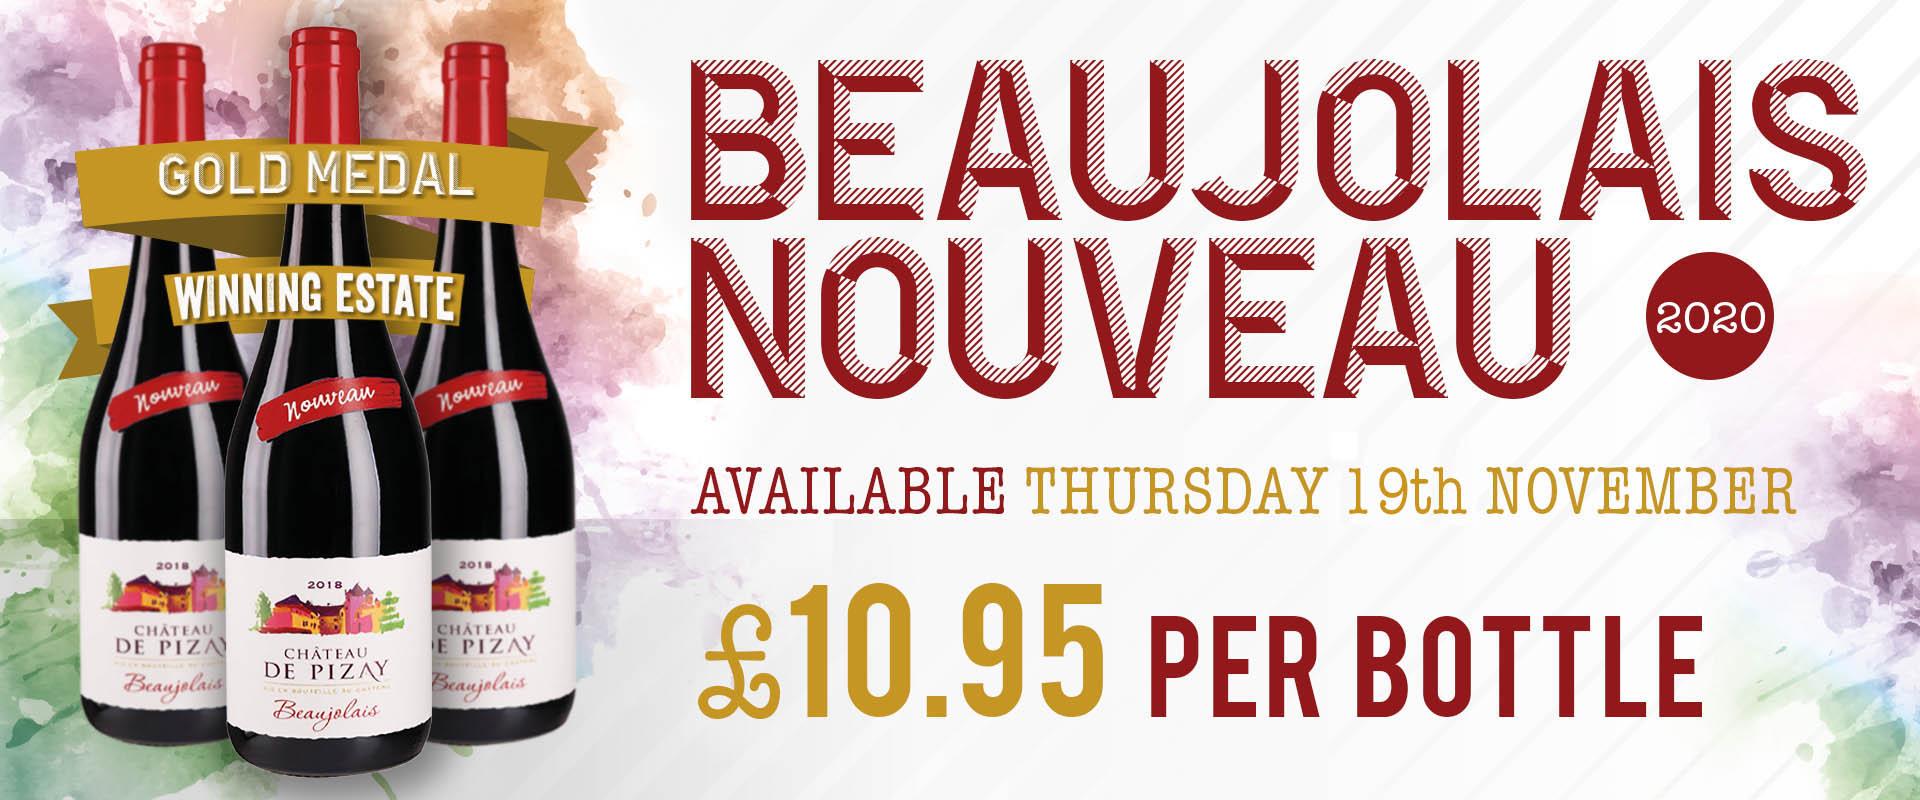 Beaujolais Nouveau Pre-order